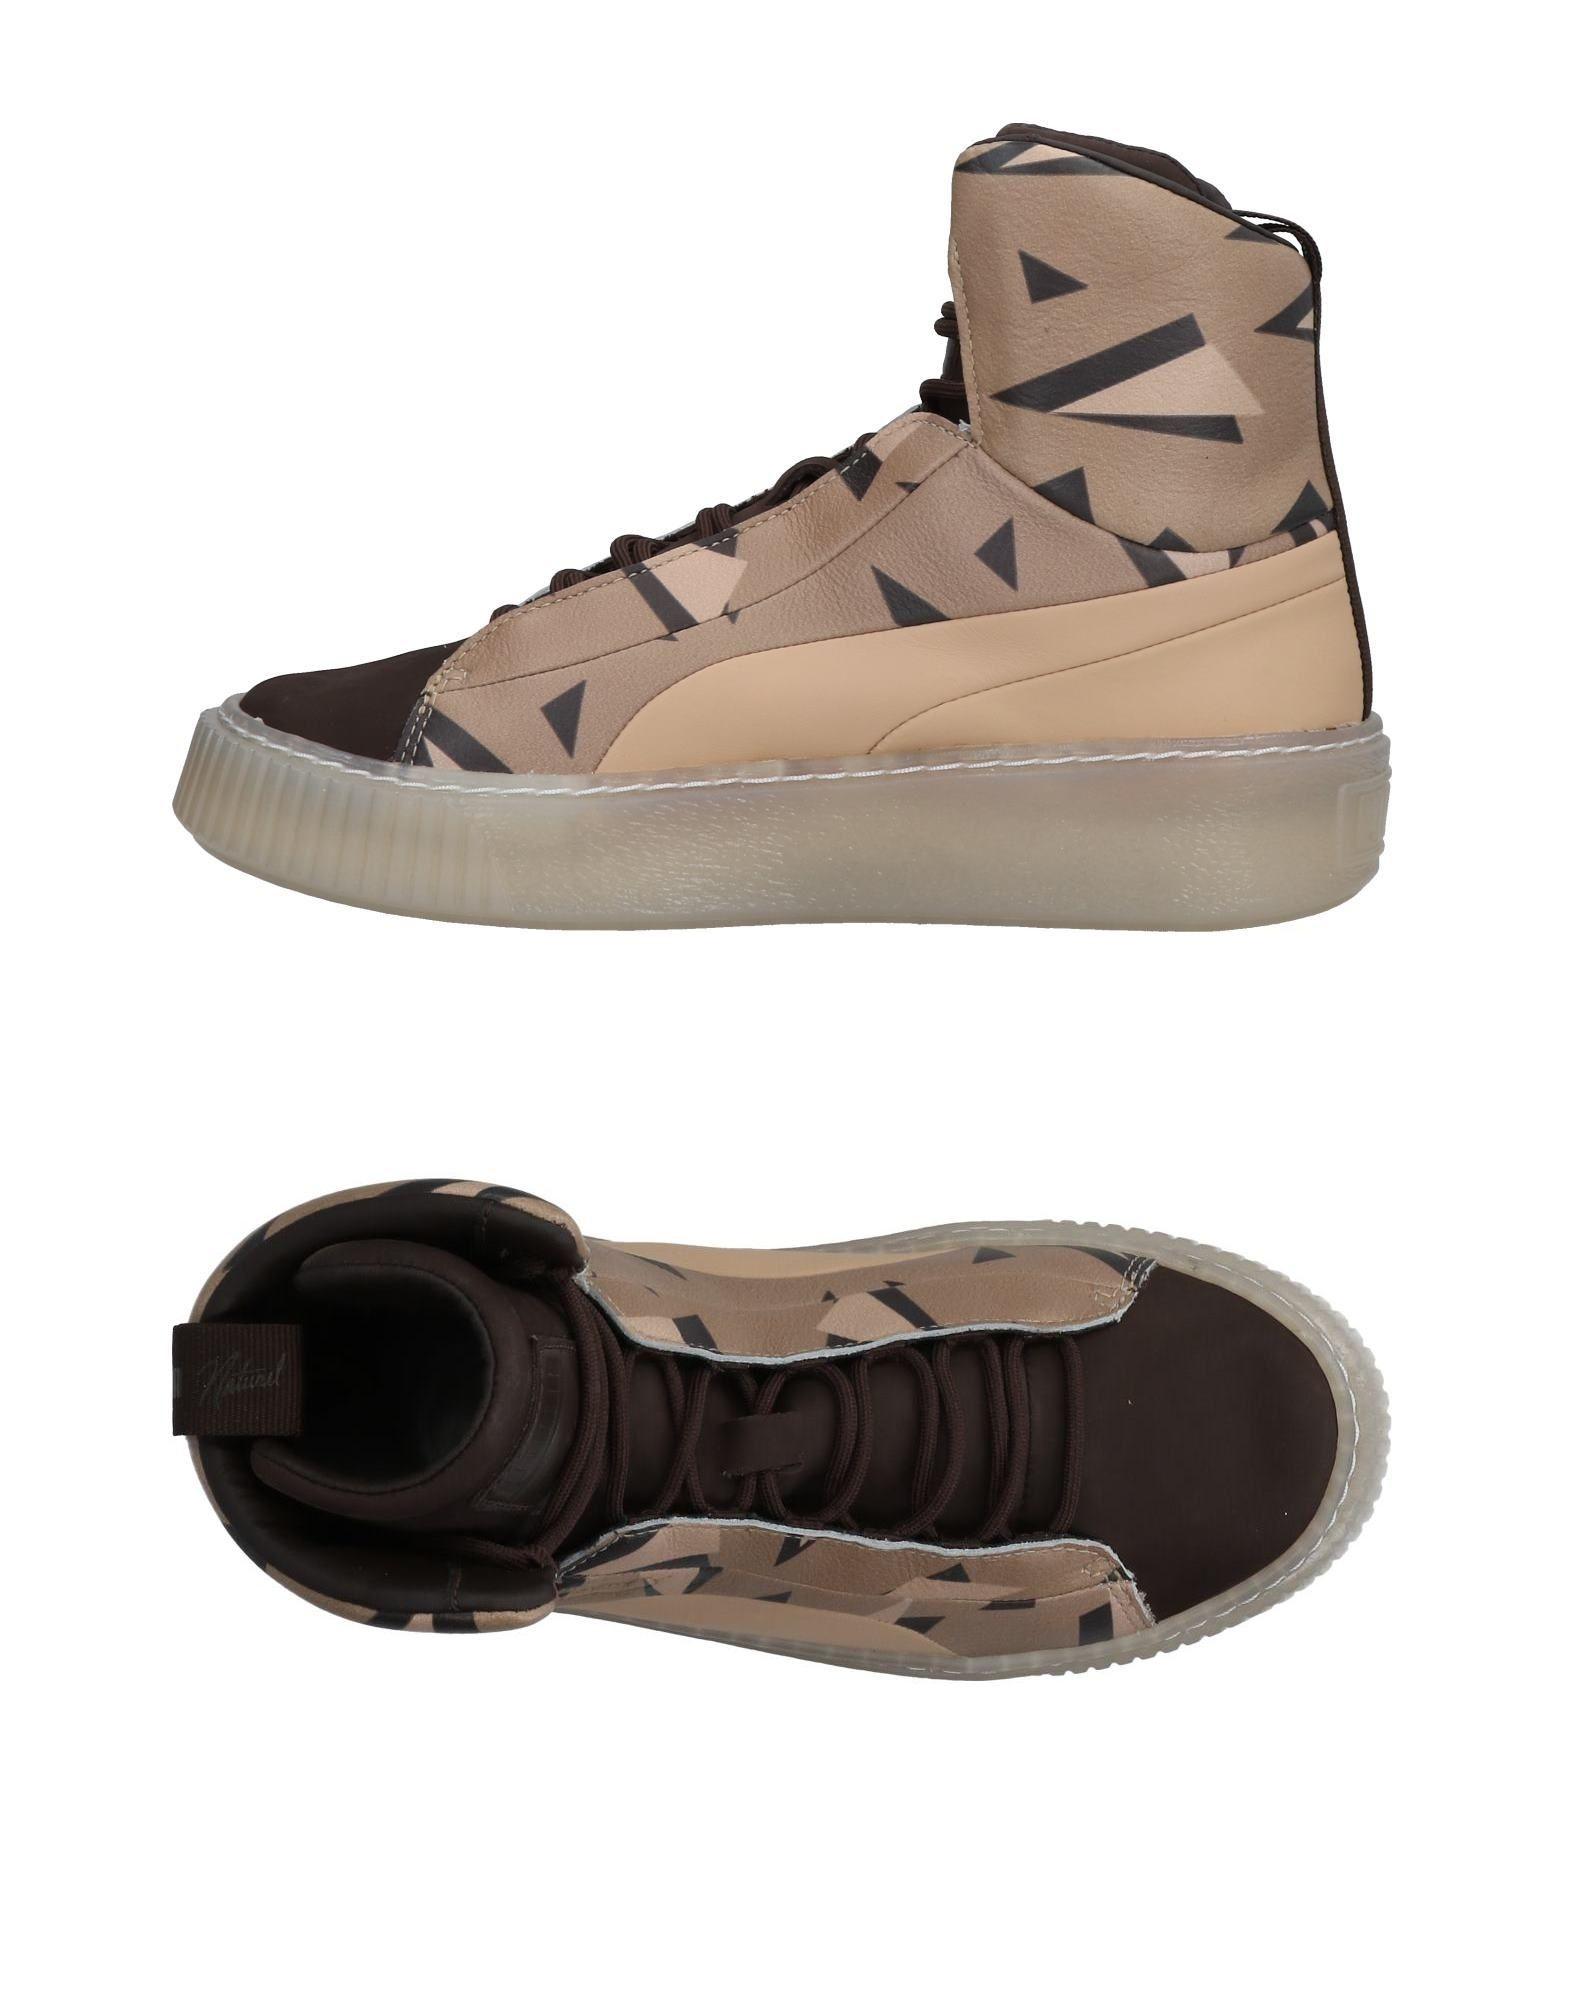 X Platmaisonbl Pumas Naturel High-tops Et Chaussures De Sport L1AwKcd